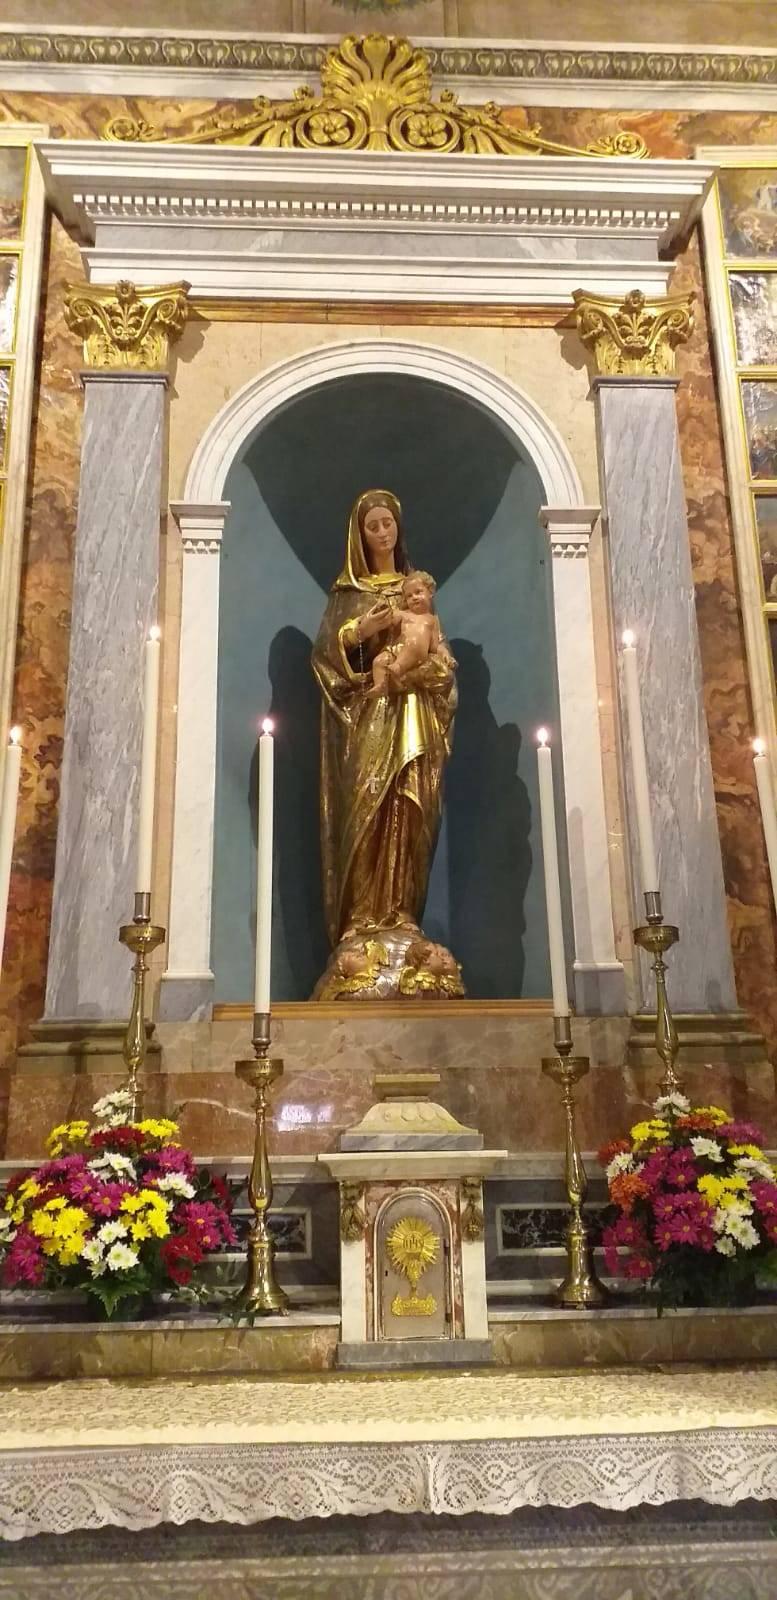 La Madonna restaurata